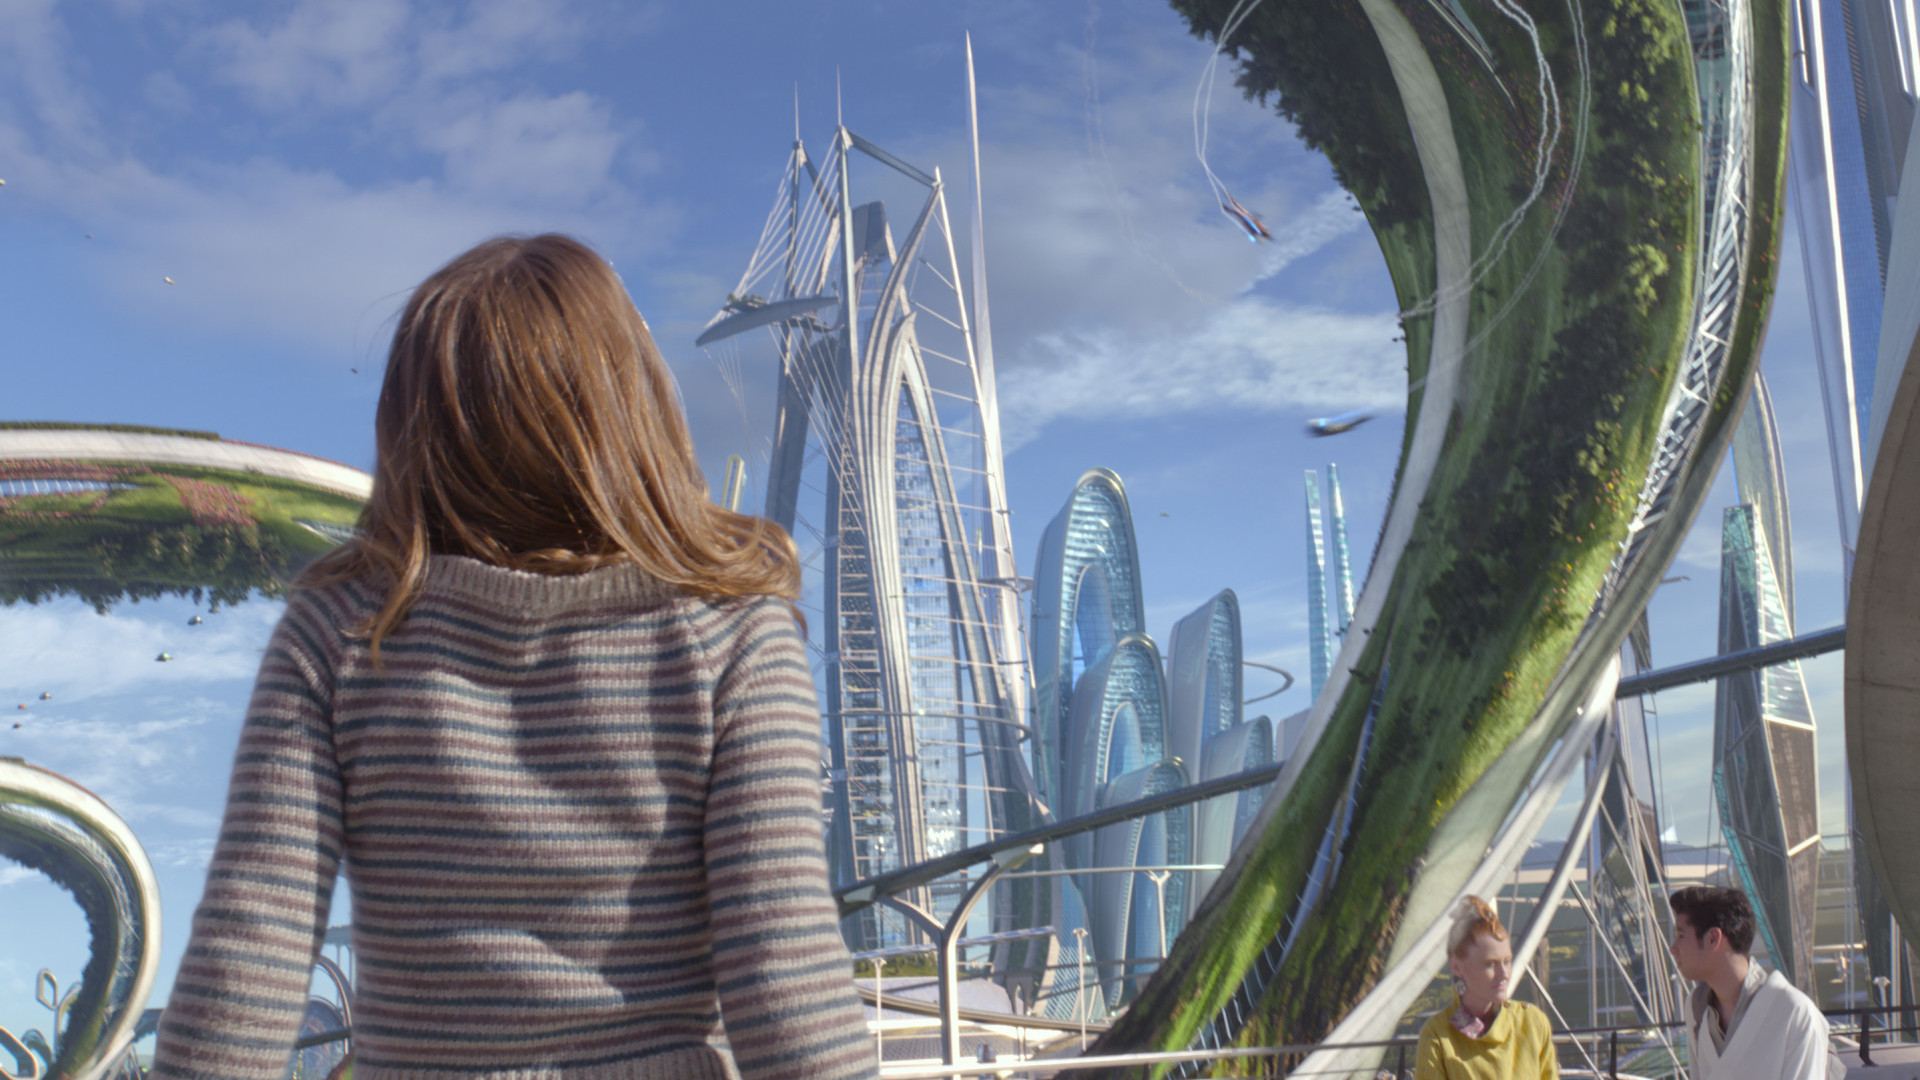 Casey (Britt Robertson) experiencesa fantastic futuristic world in Tomorrowland. (Courtesy of Disney)